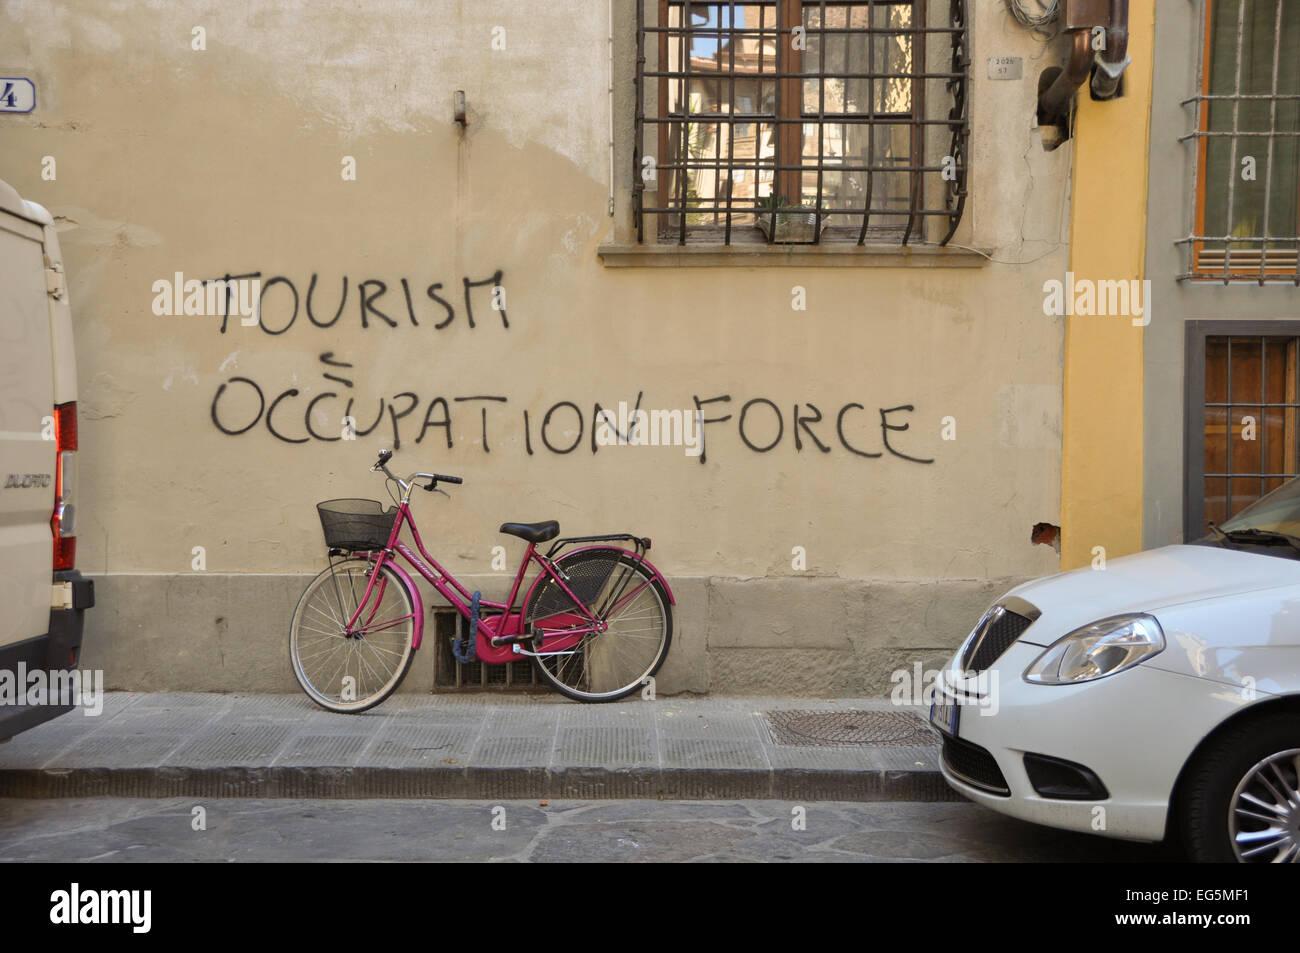 Turismo anti graffiti en pared en Florencia por encima de pink bike - Italia Imagen De Stock